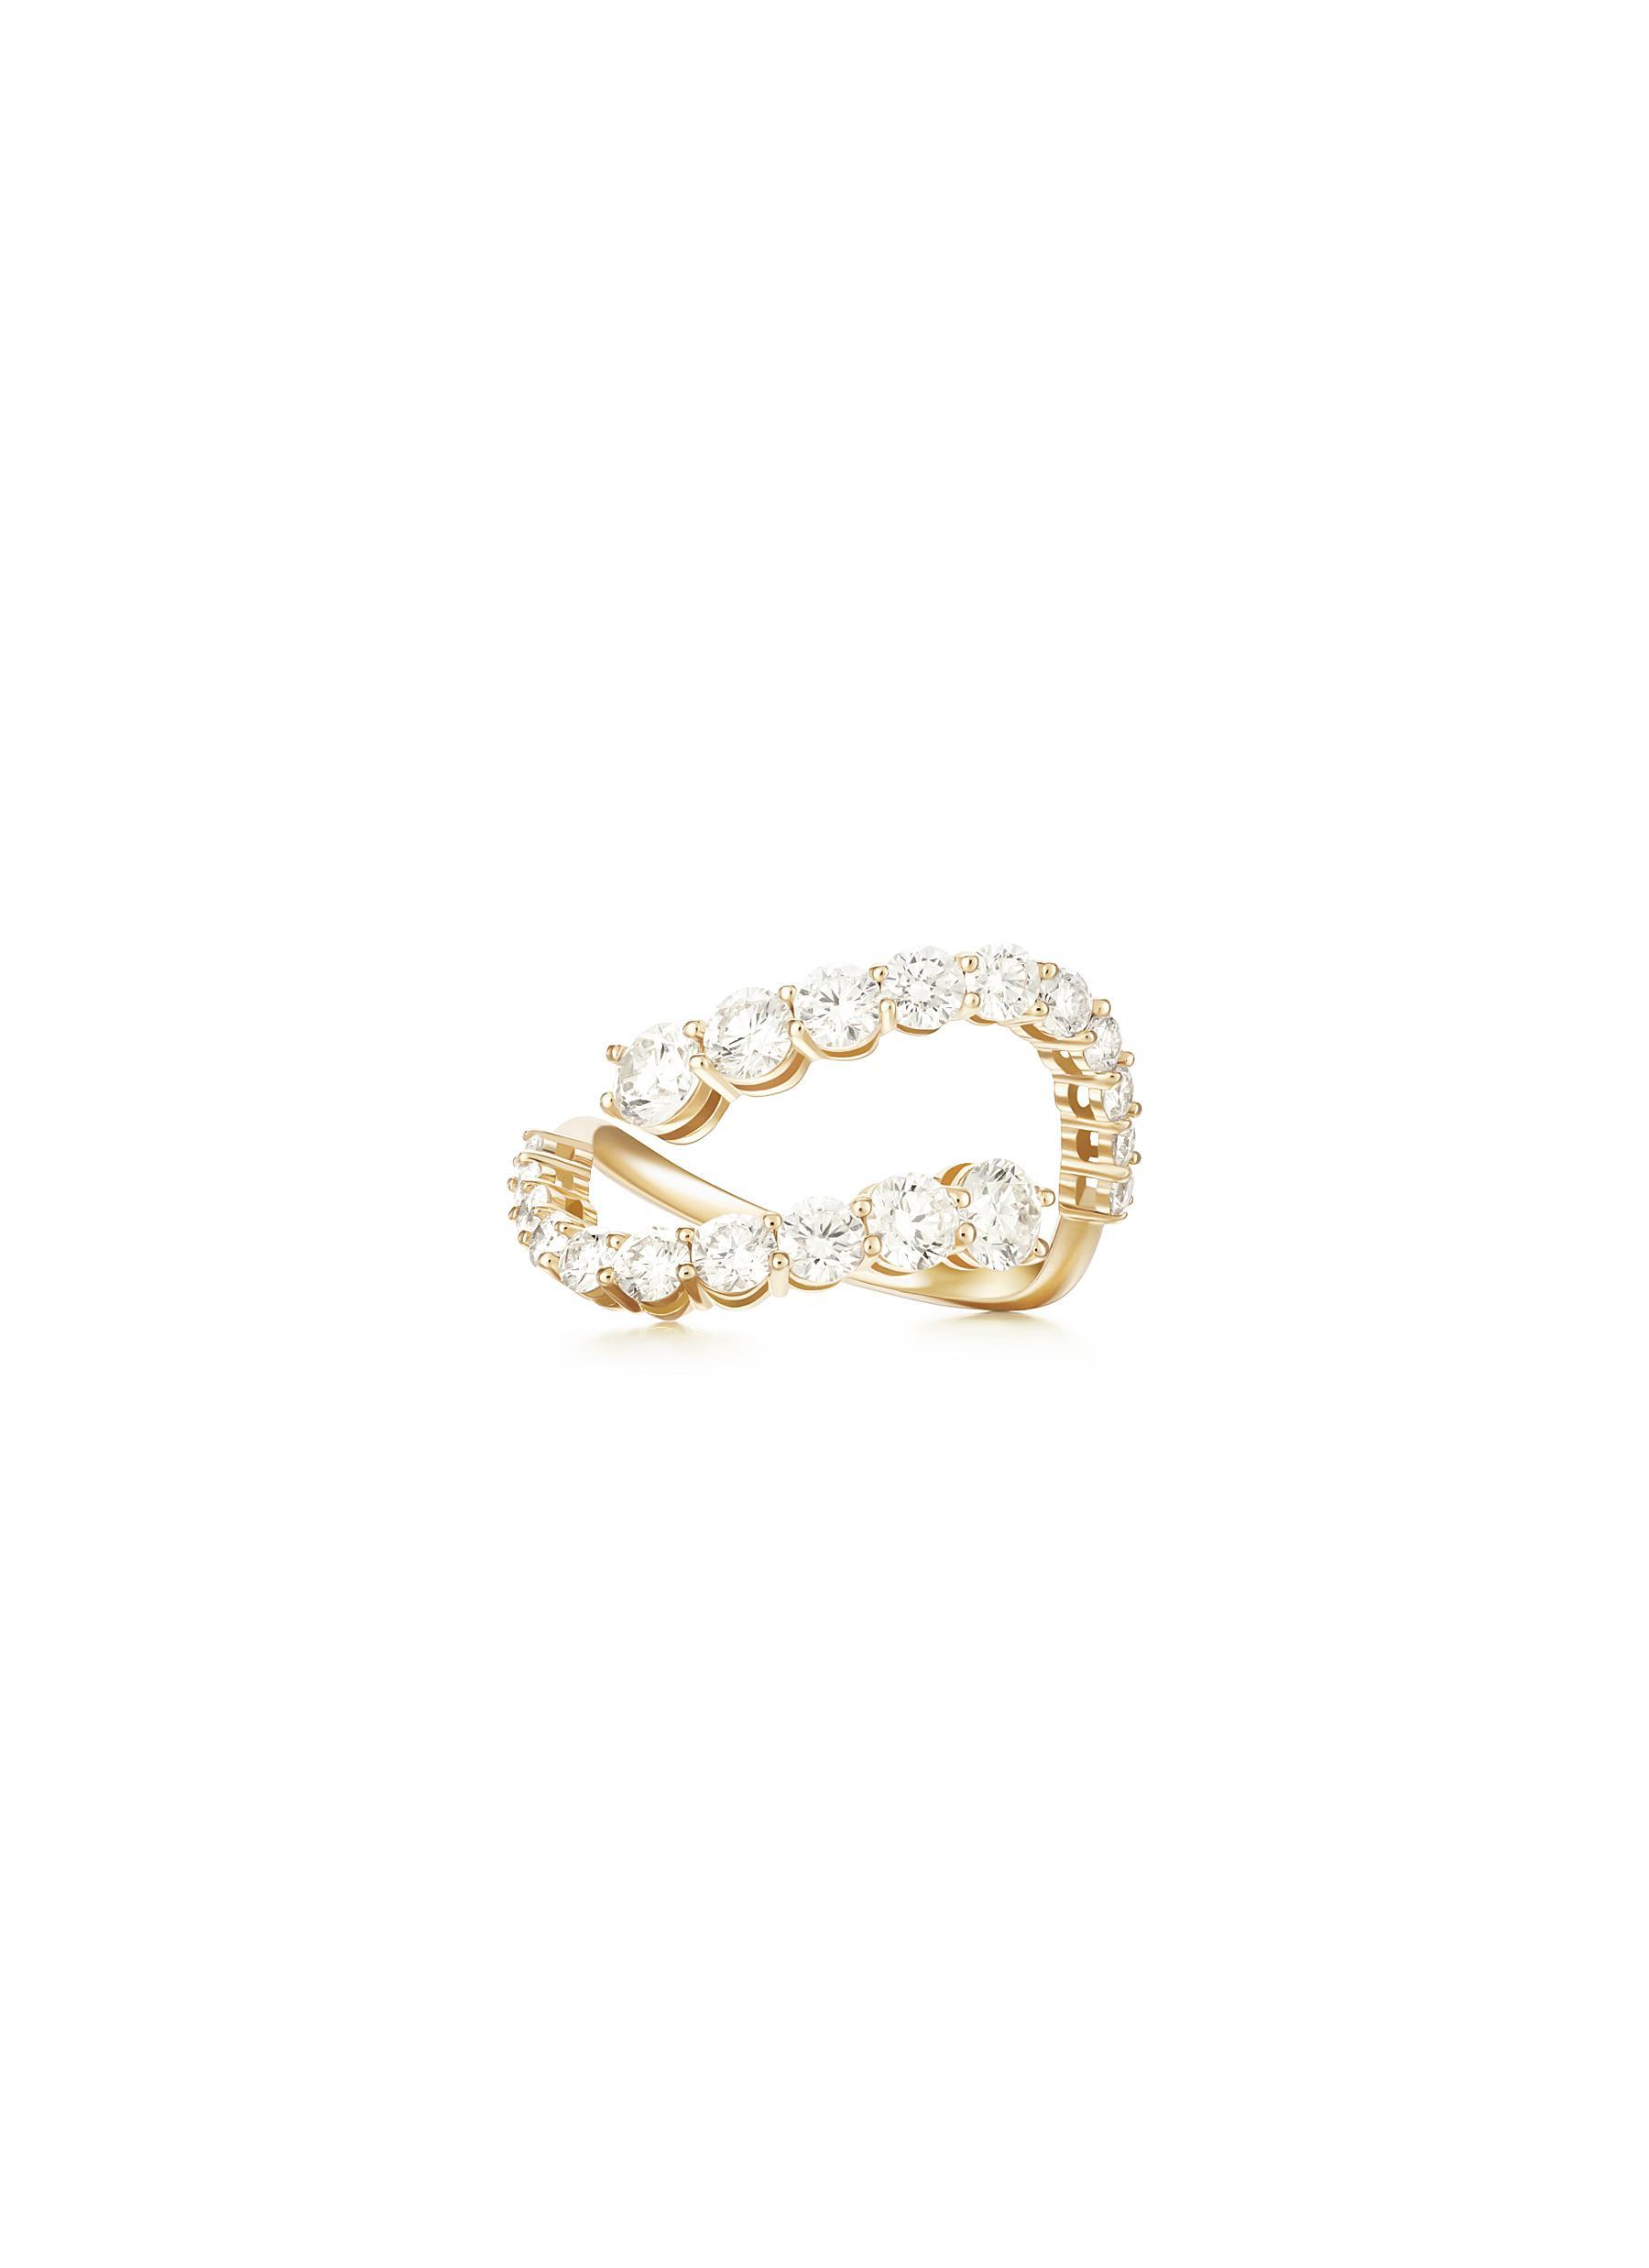 'Aria Skye' Diamond 18k Gold Double Band Ring